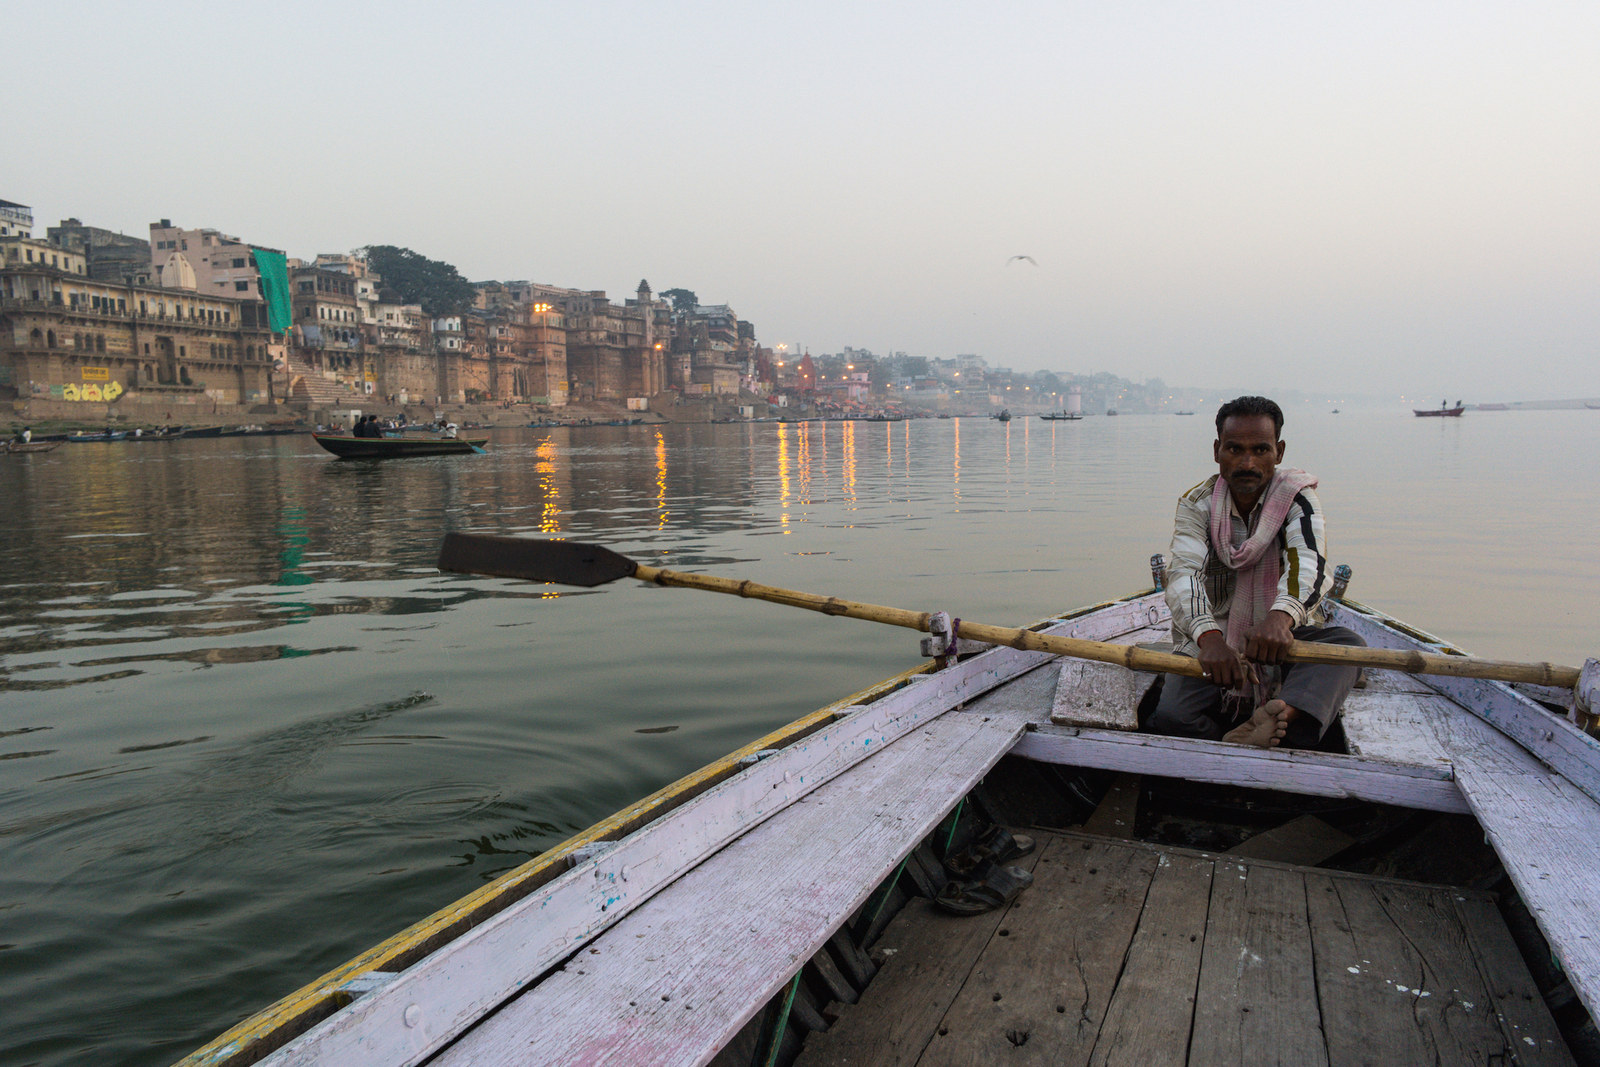 """Waiting for Tourists"" by Grzegorz Piaskowski, taken in Varanasi, India"